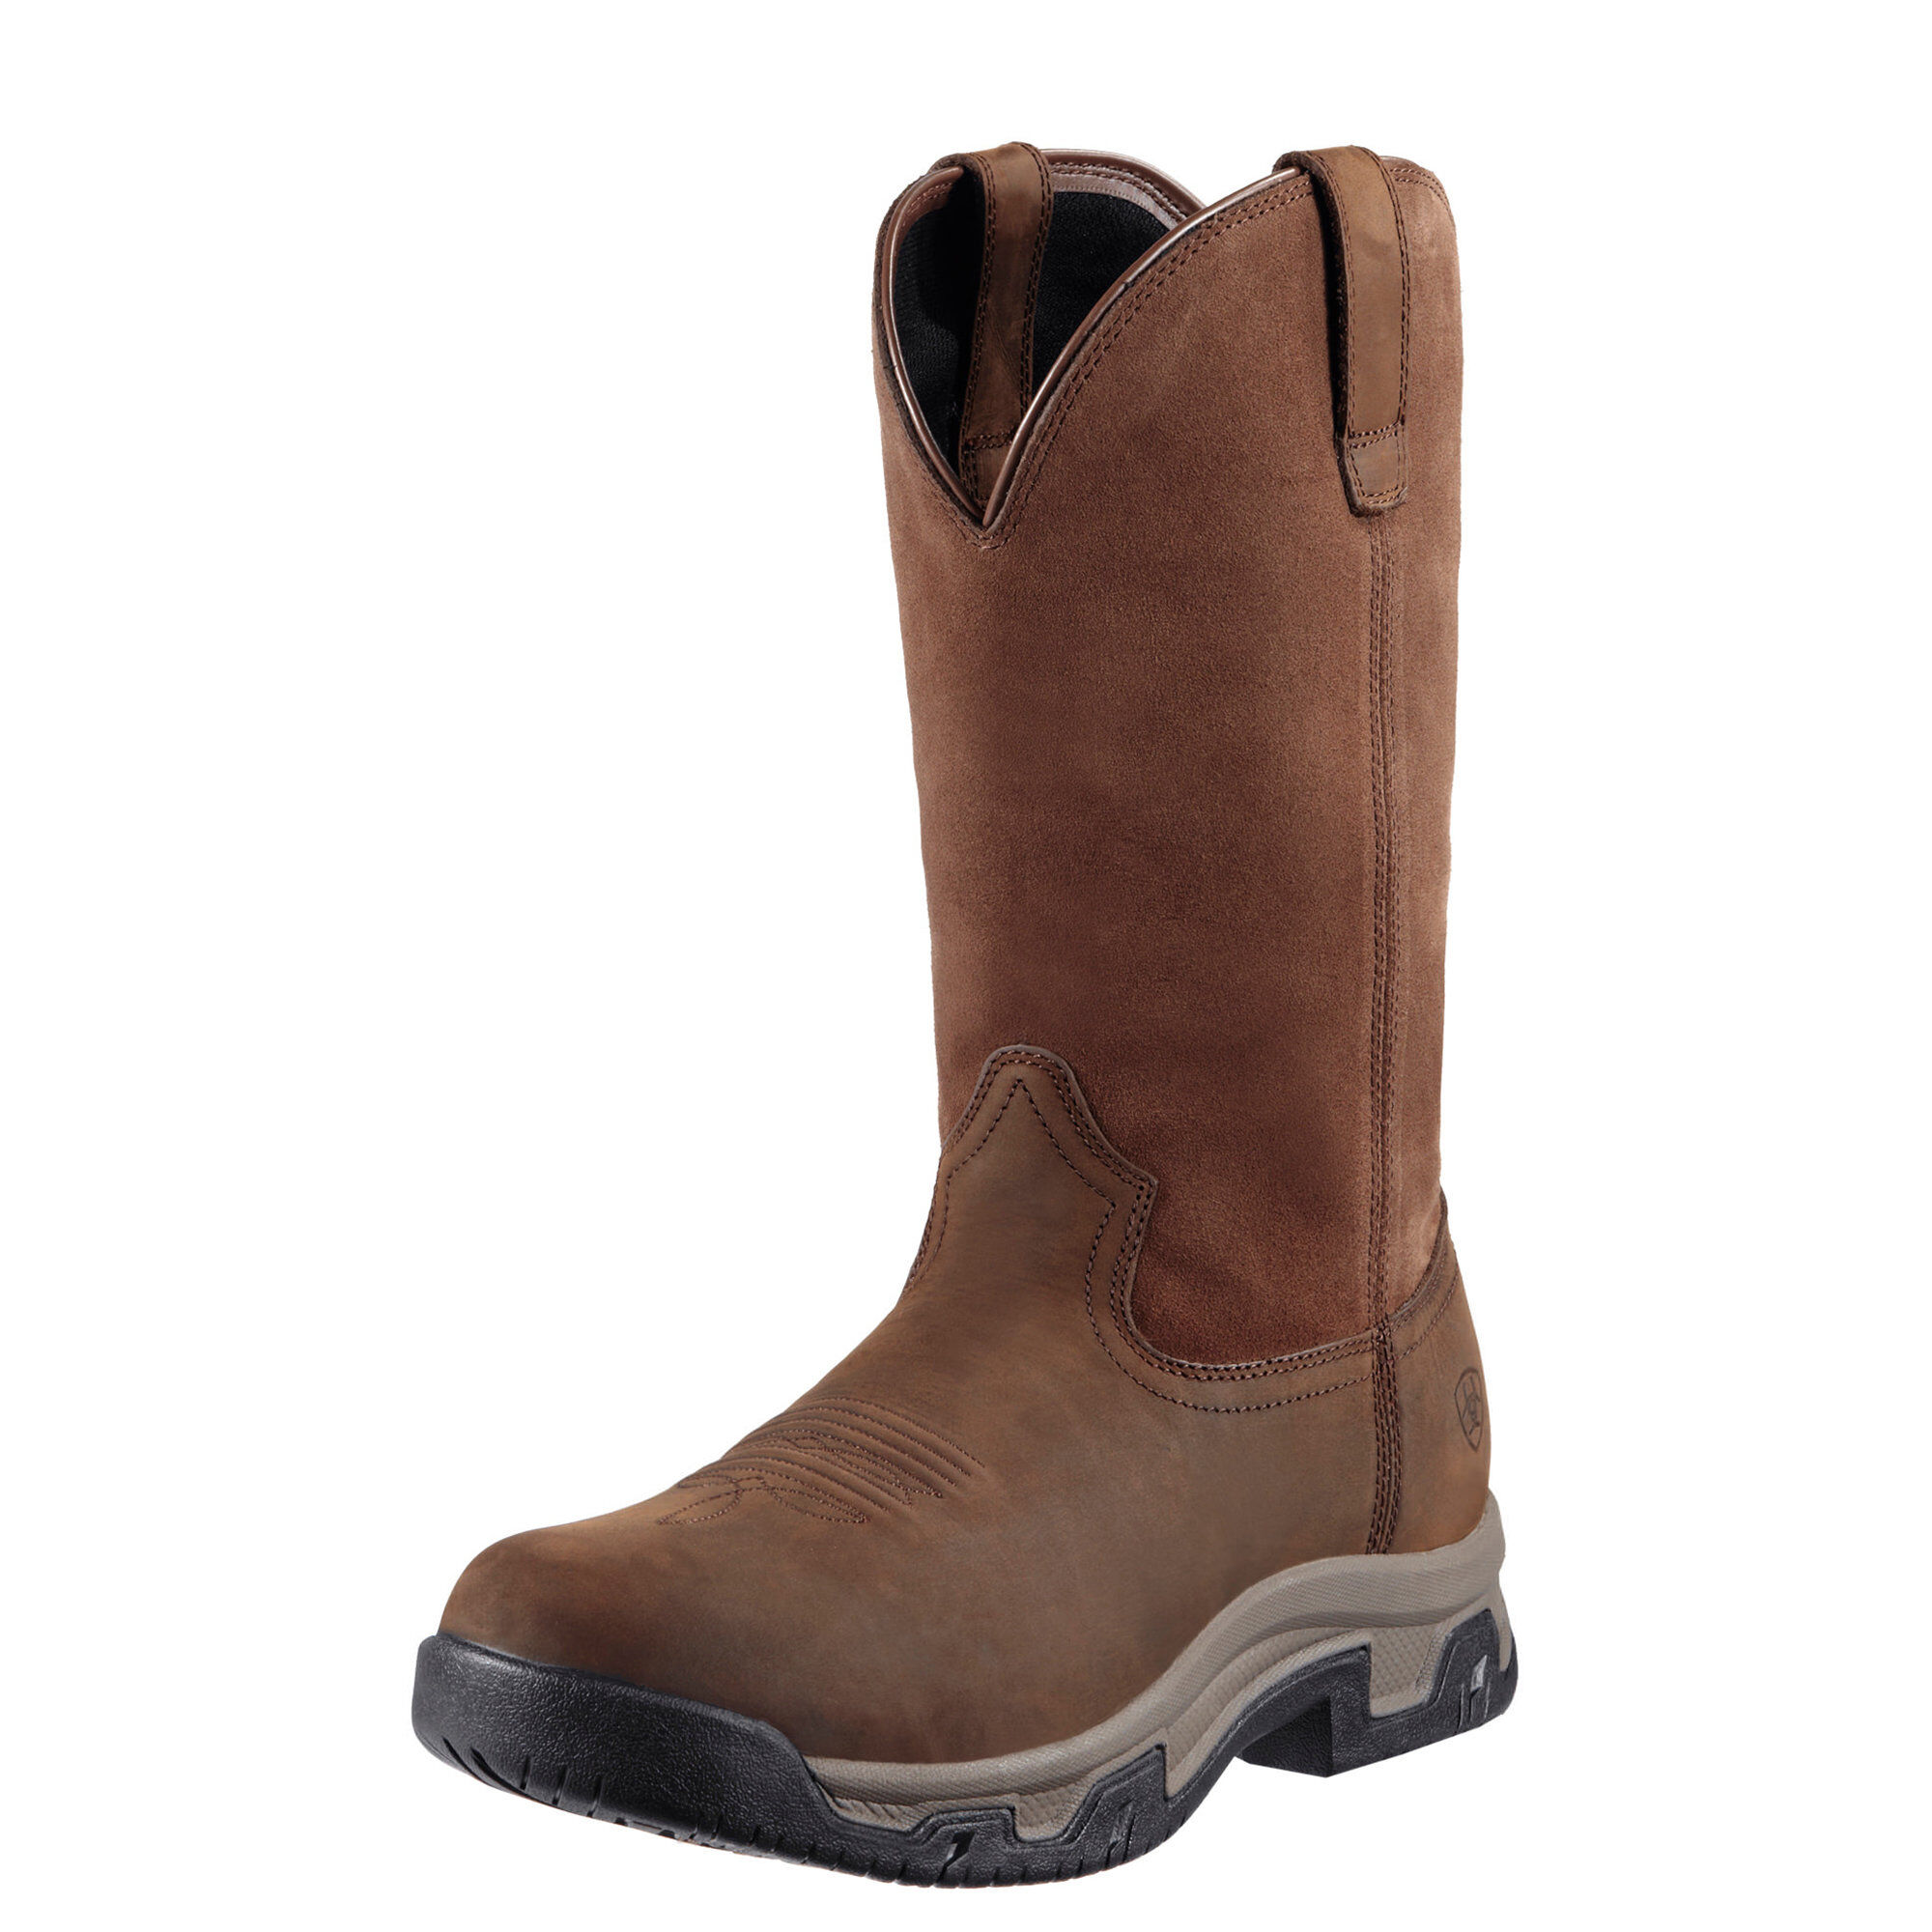 Terrain Pull On Waterproof Boot   Ariat